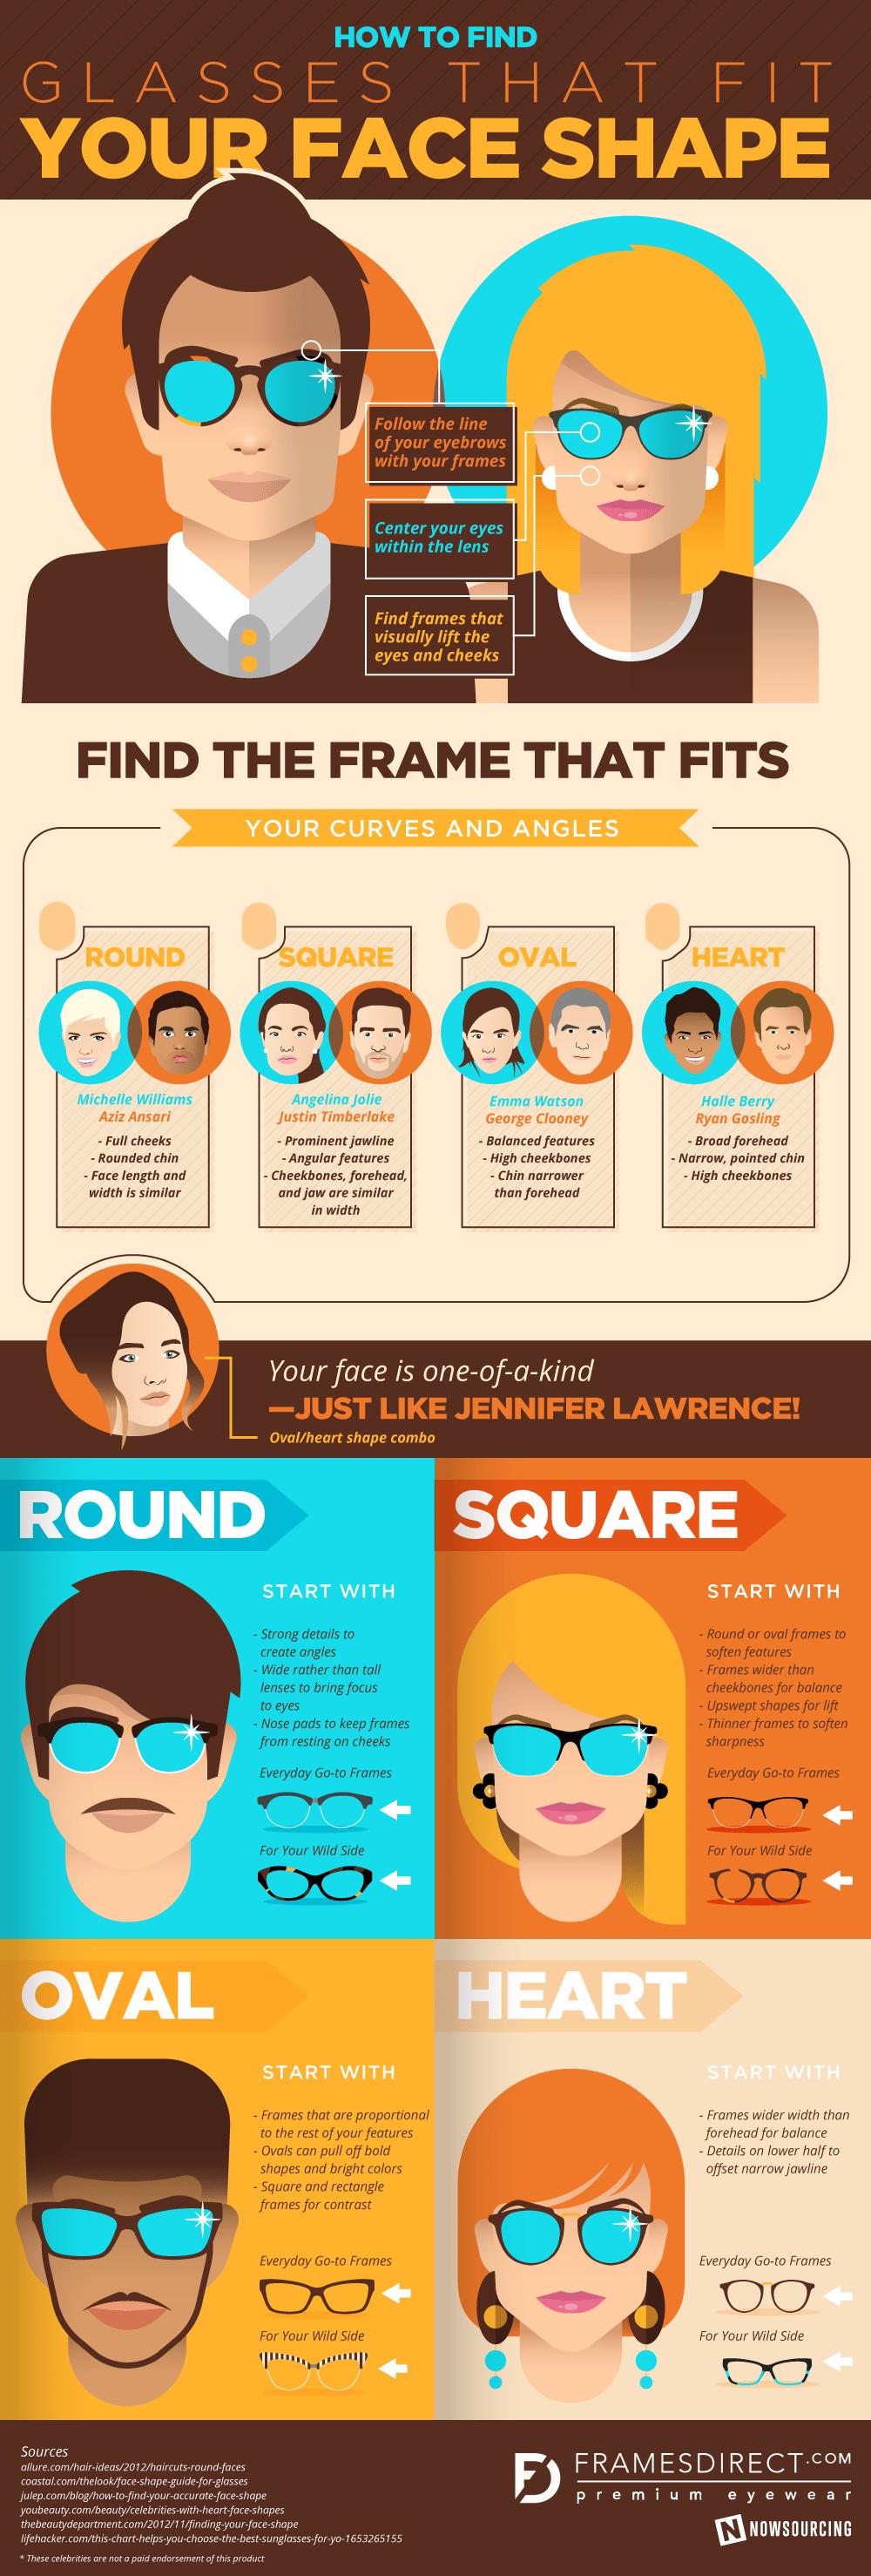 face-shape-info